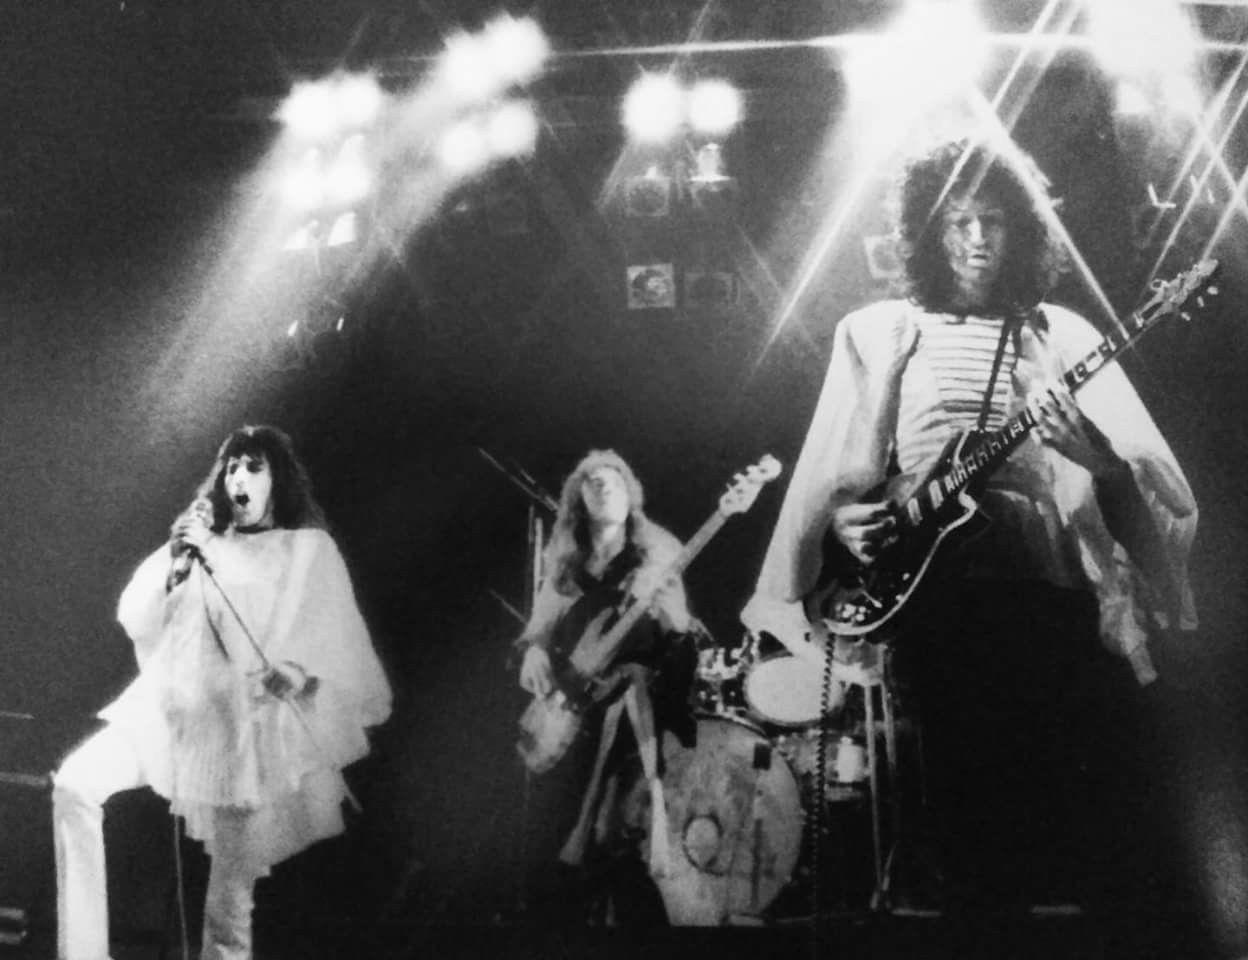 Queen live (May 1974?)